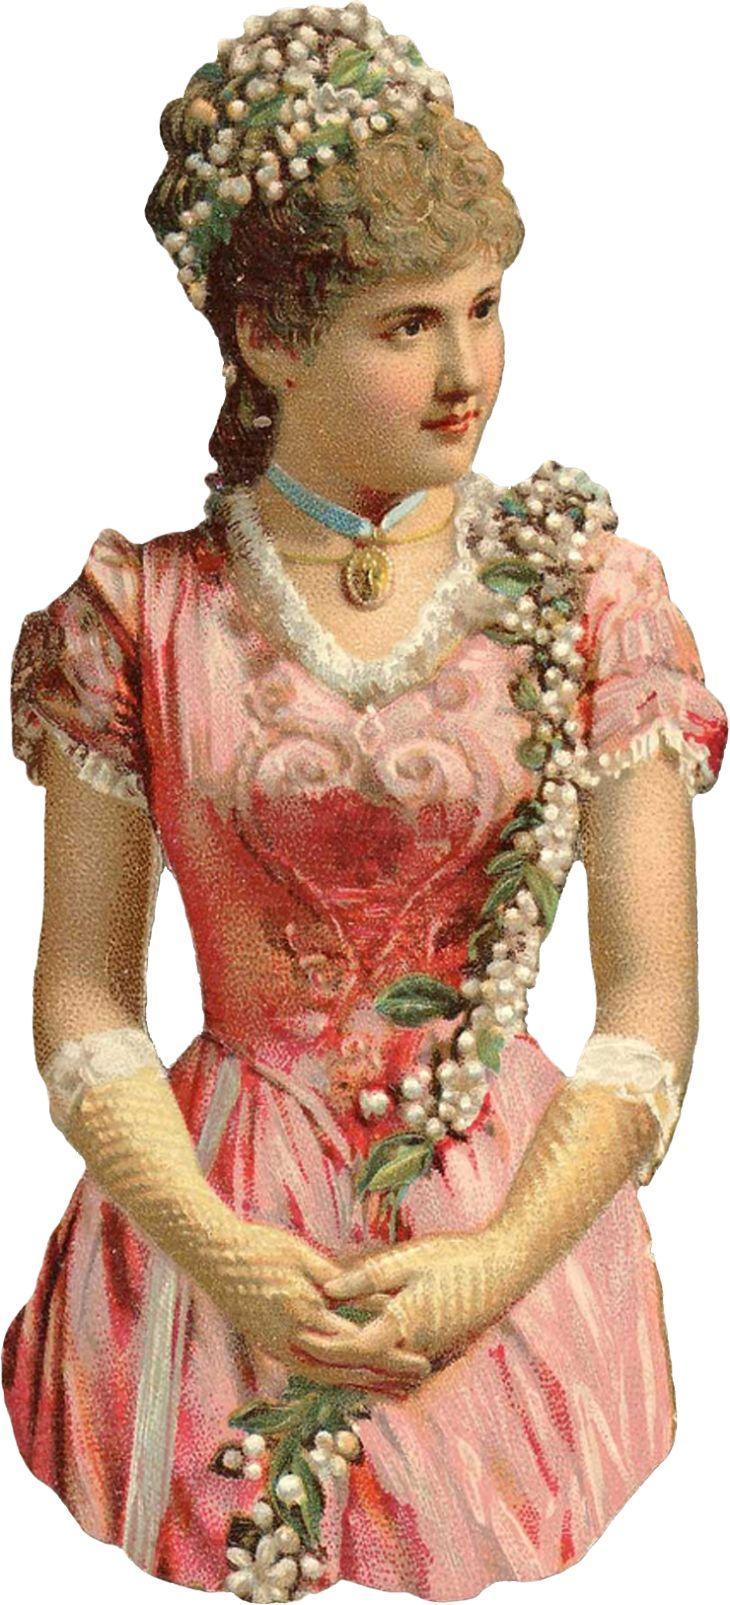 Wings of Whimsy: Victorian Scaps - Glove Lady 1 #vintage #ephemera #printable #freebie #scrap